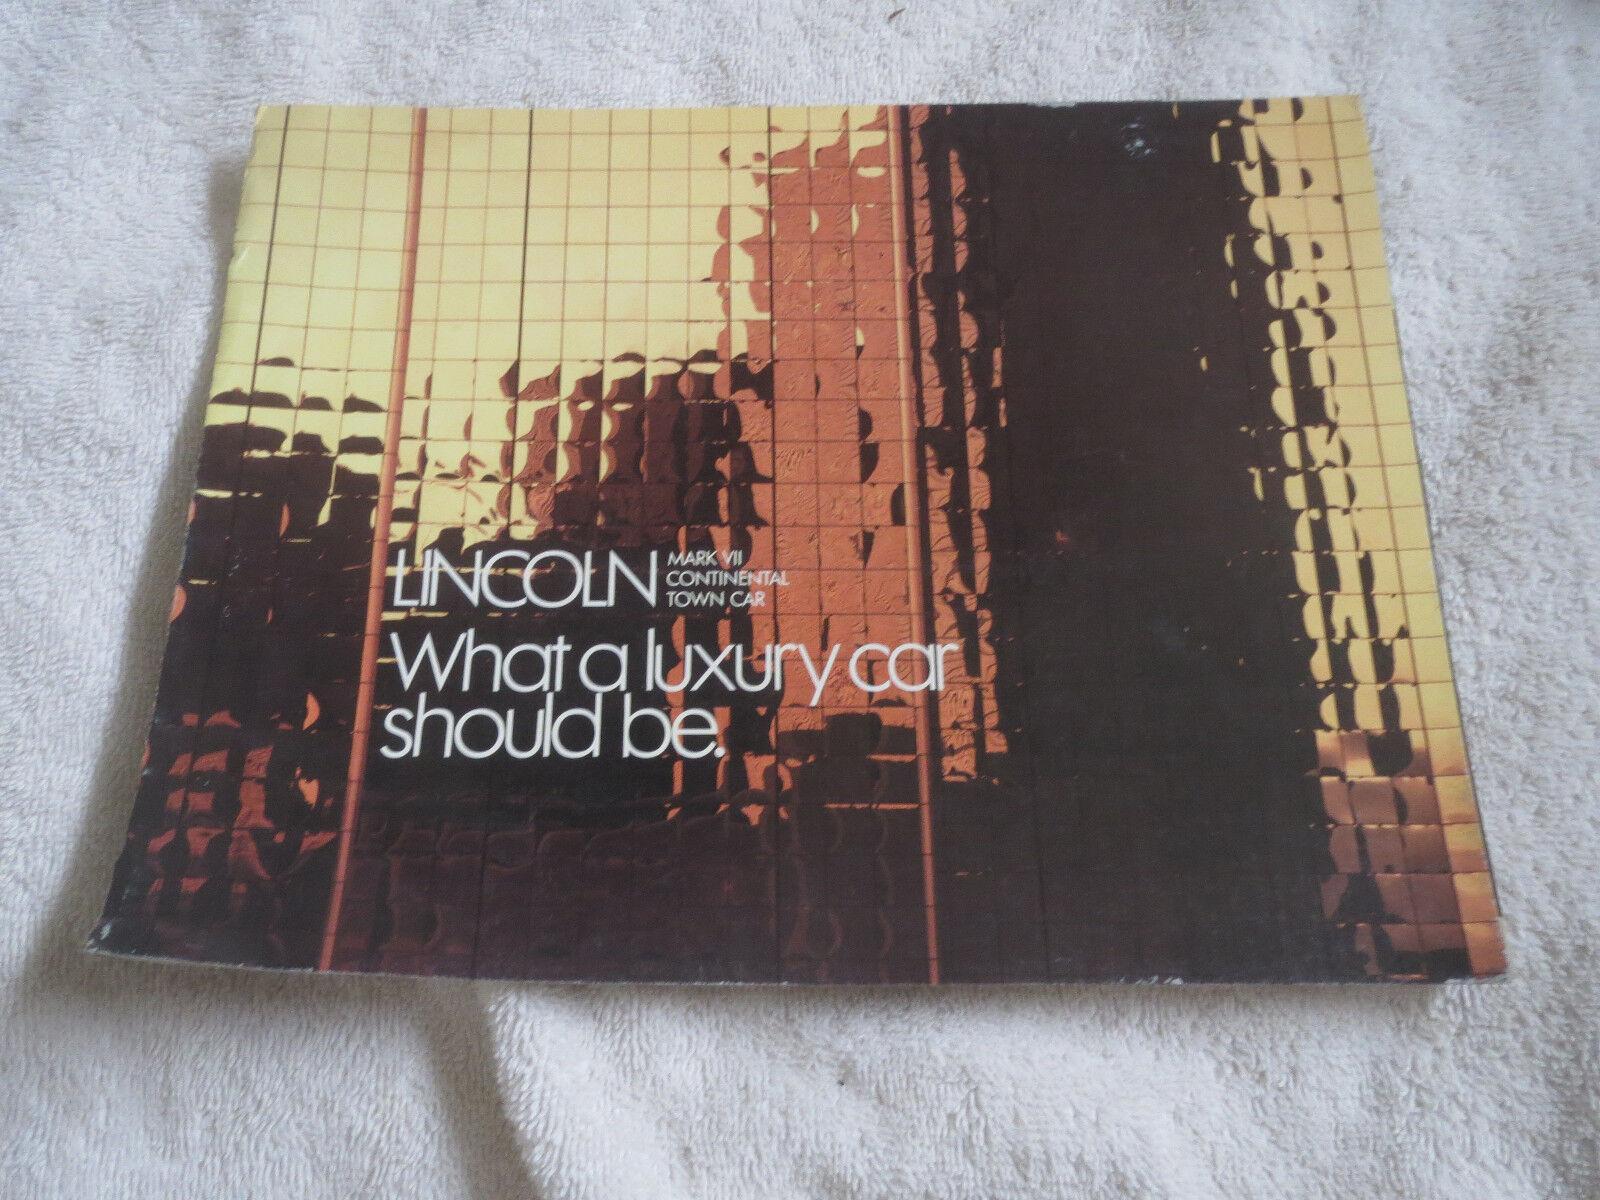 1987 LINCOLN CONTINENTAL TOWN CAR MARK VII ORIGINAL DEALER SALES BROCHURE